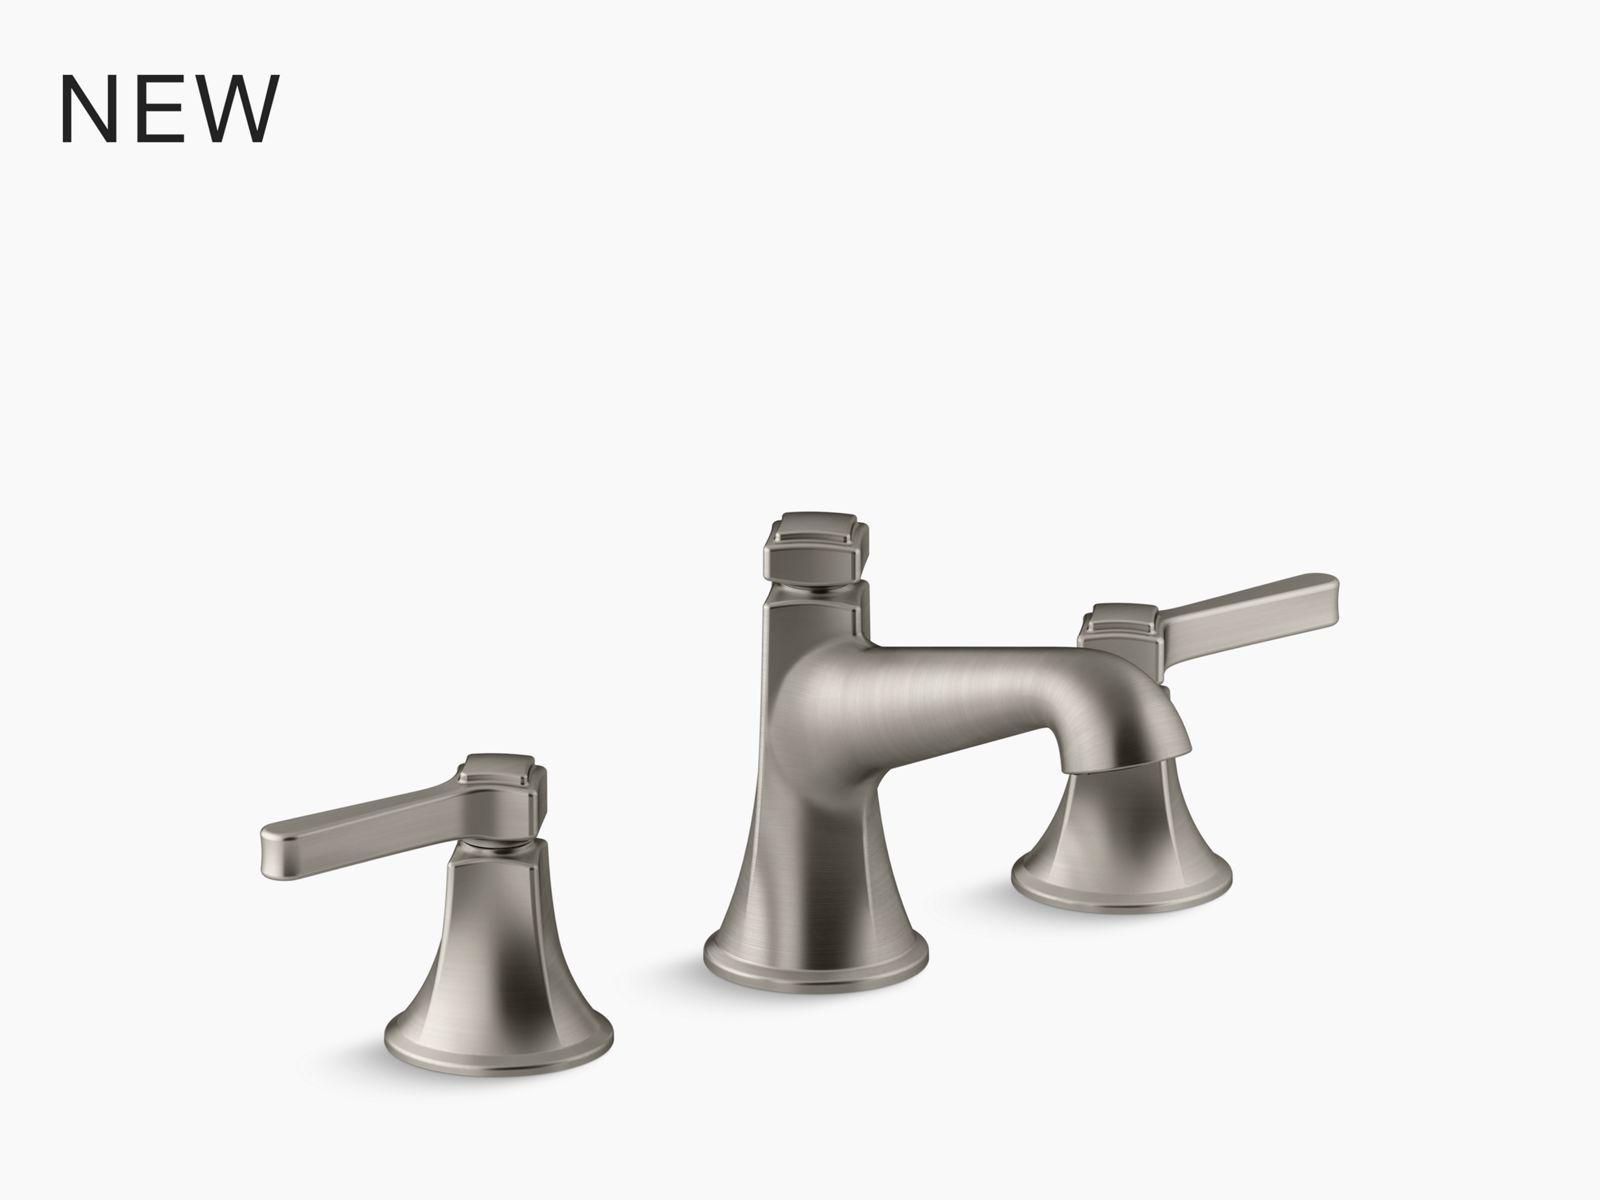 wall mount bath shower faucet 72282t